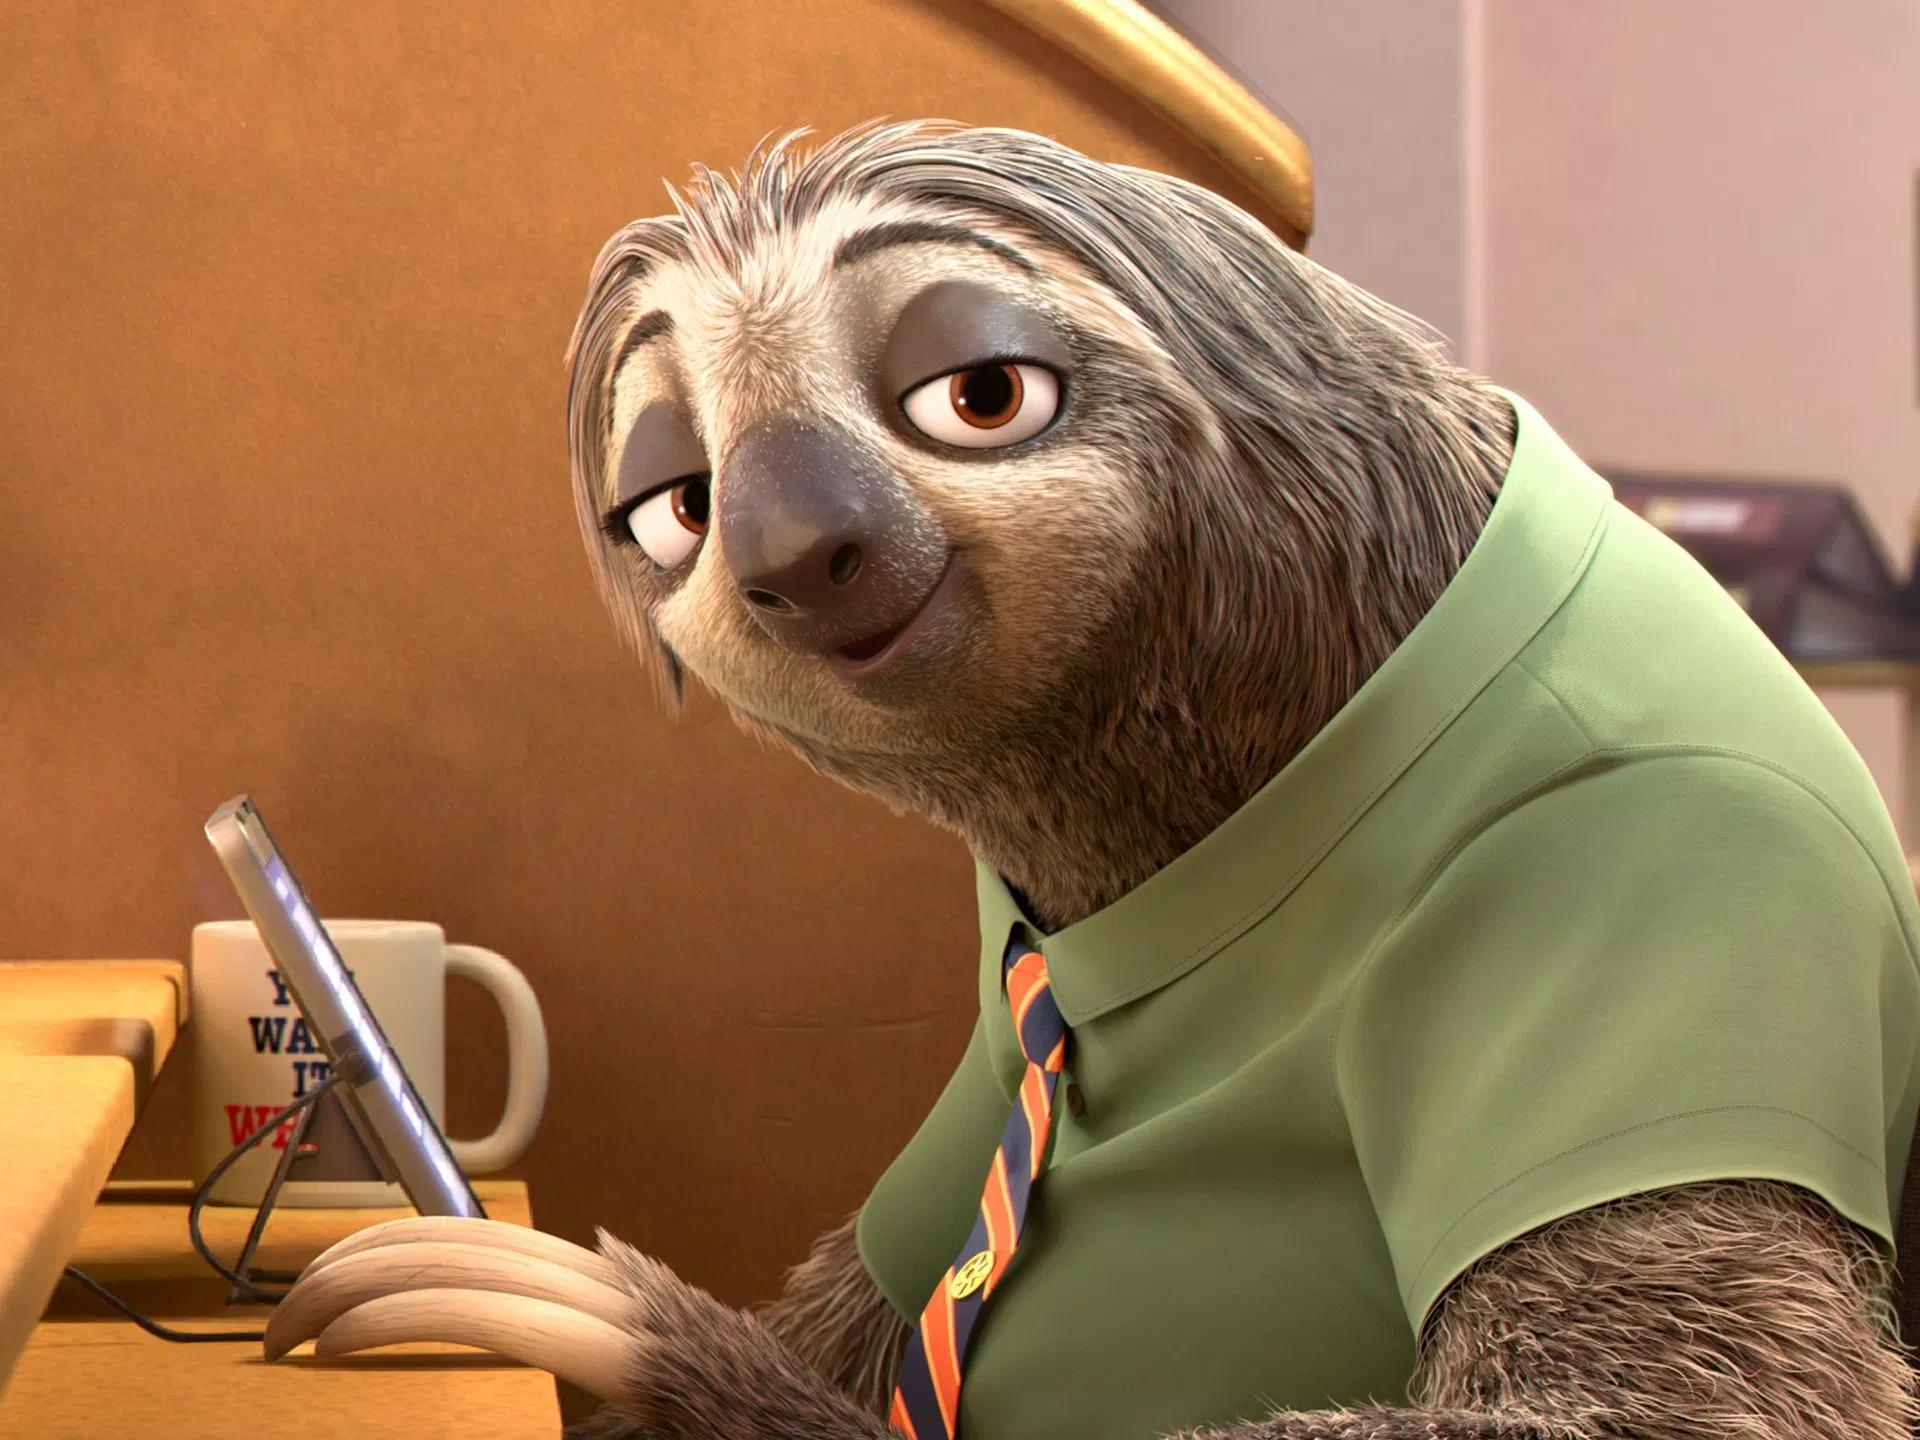 Ti senti un bradipo?